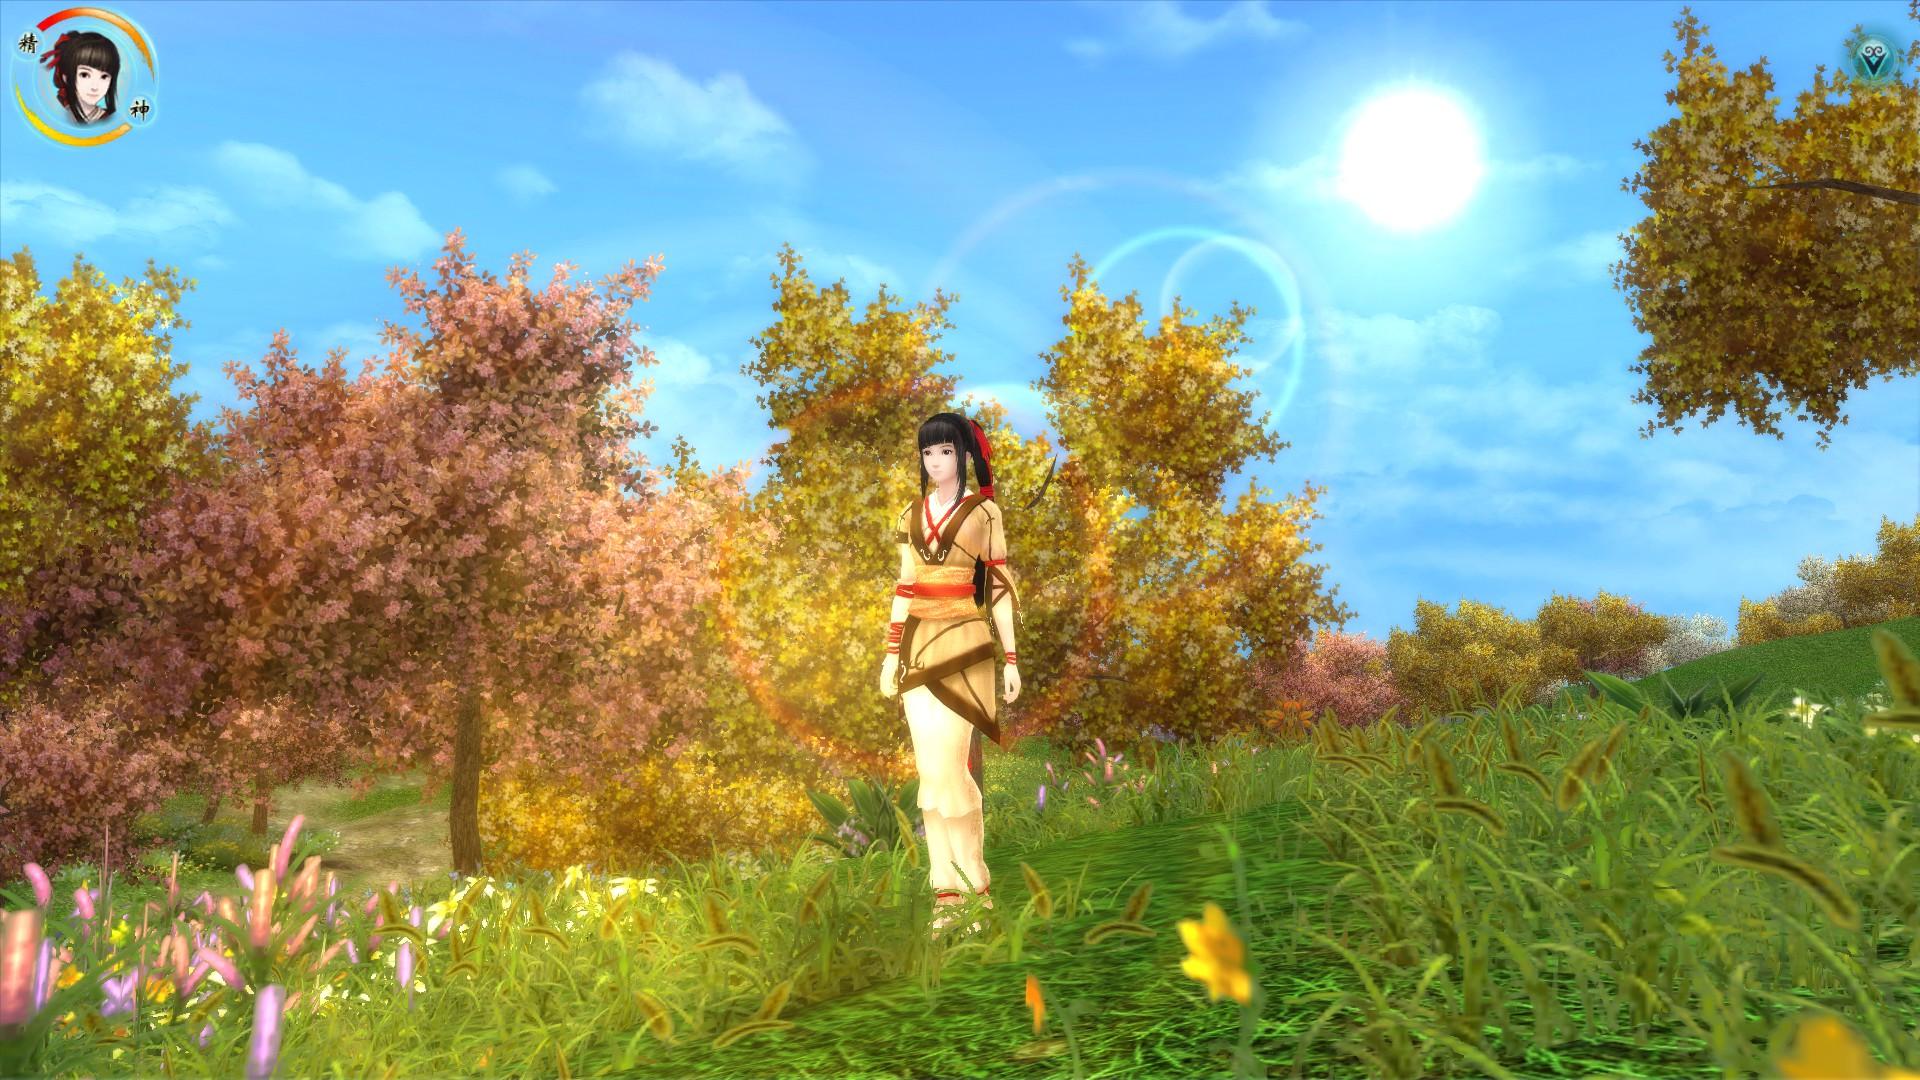 仙剑奇侠传五 前传(Chinese Paladin:Sword and Fairy 5 Prequel) screenshot